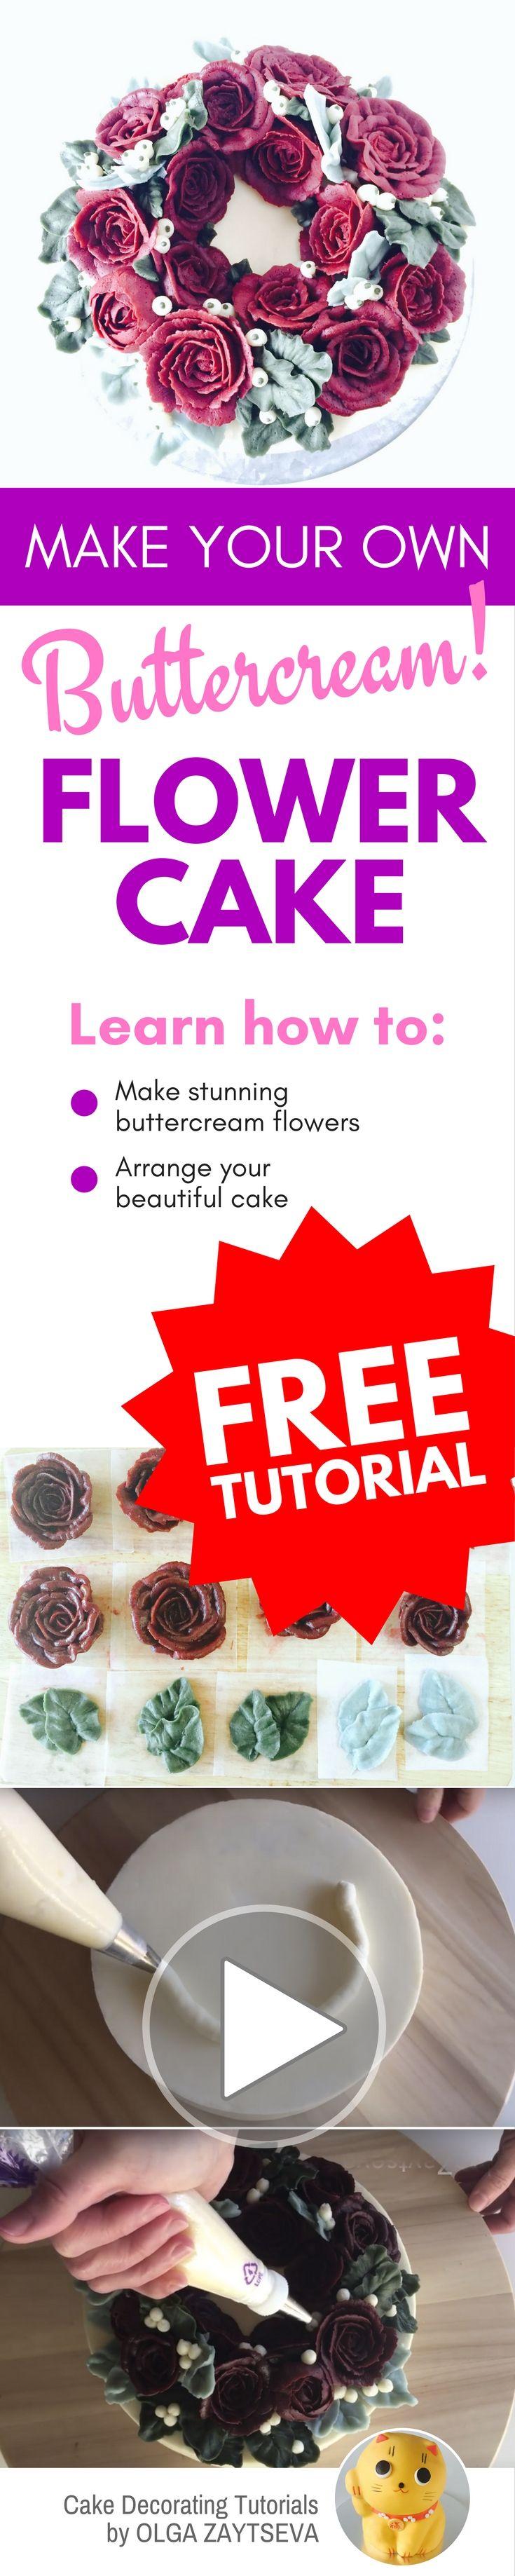 How to make Buttercream Red Roses Flower Wreath cake - Cake decorating tutorial by Olga Zaytseva. Learn how to pipe buttercream roses and create this quick and easy flower wreath cake in red. #cakedecorating #cakedecoratingtutorial #buttercreamflowercake #buttercreamflowers